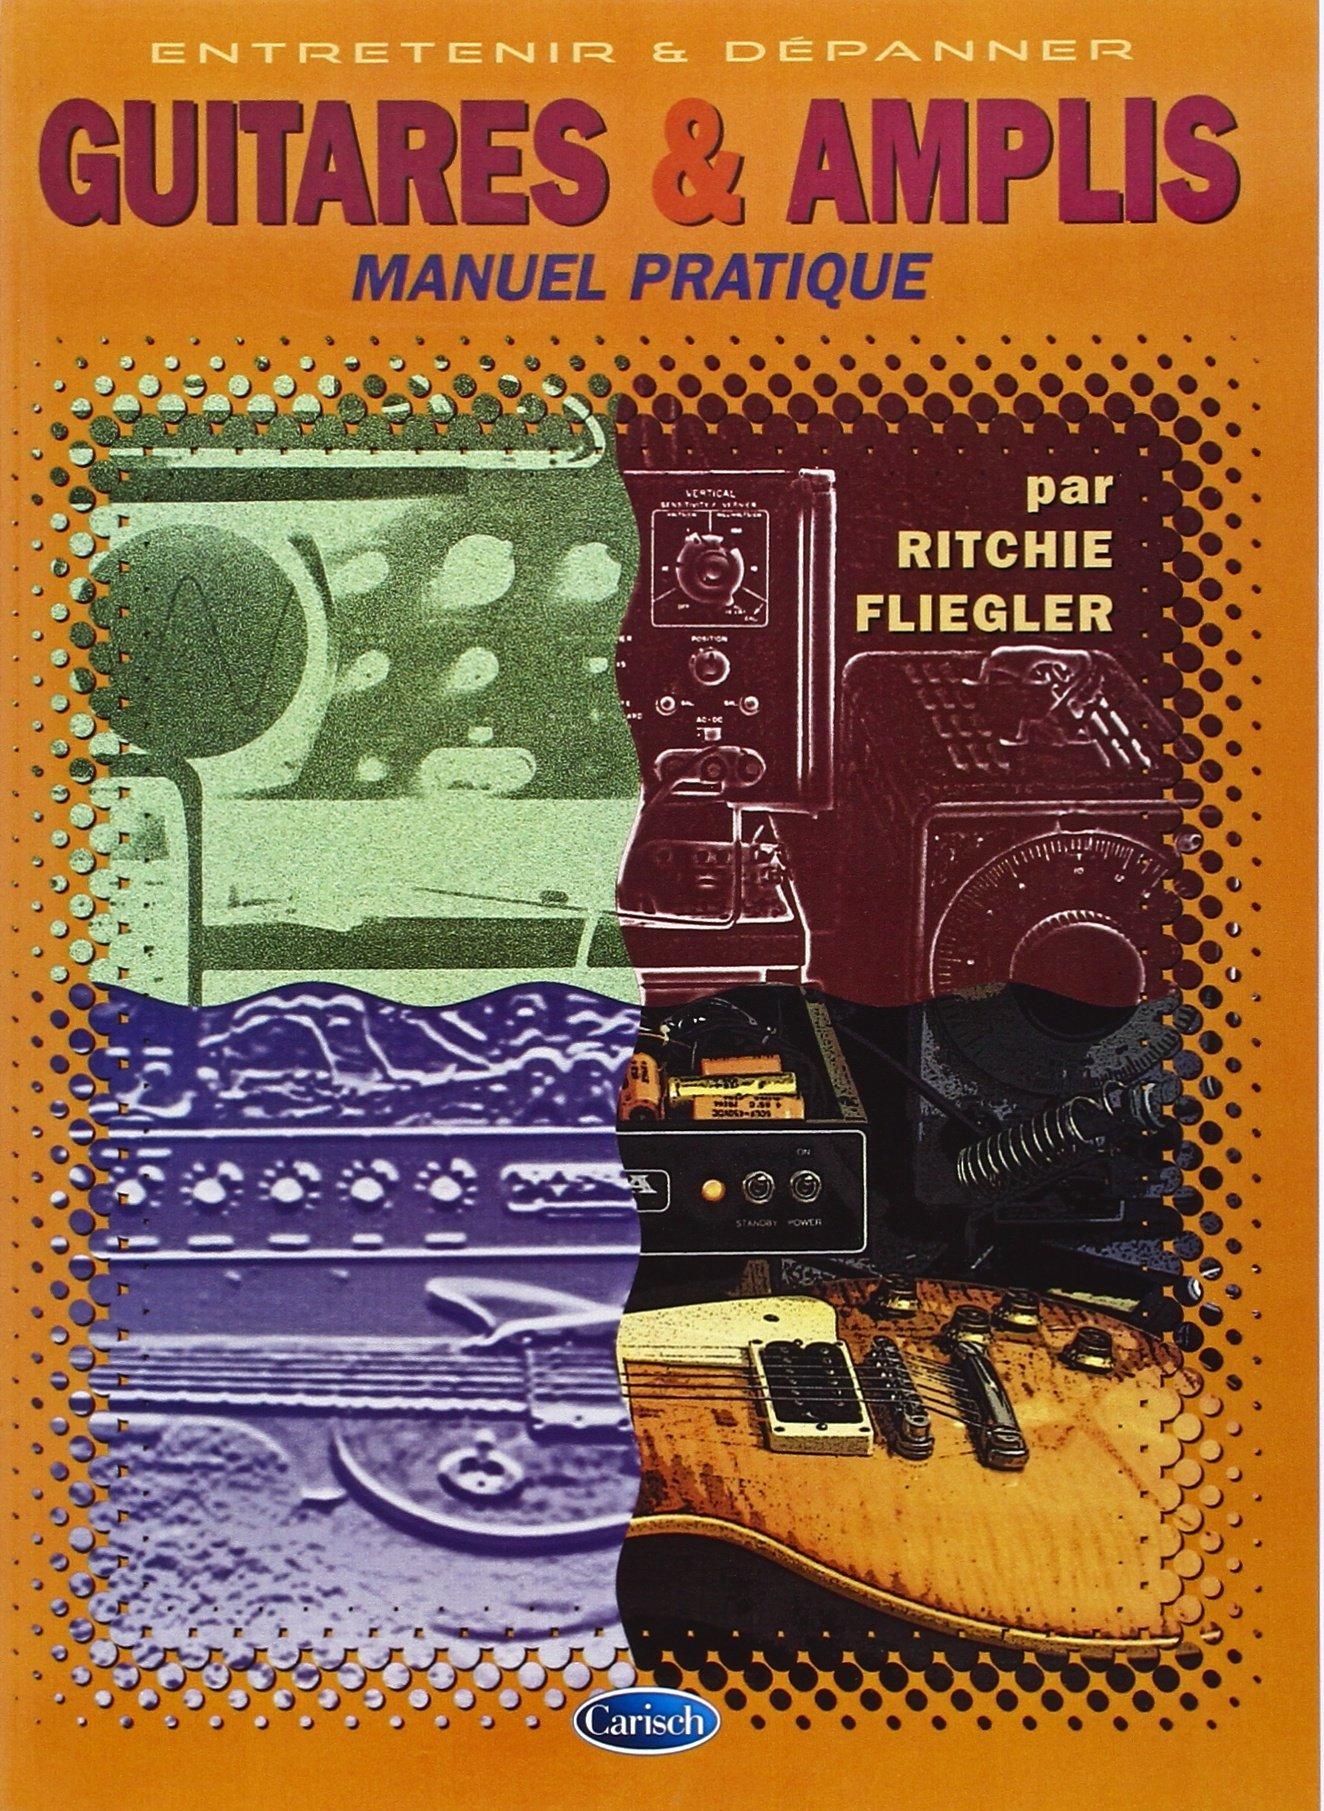 Fliegler Ritchie Guitares & Amplis Book French